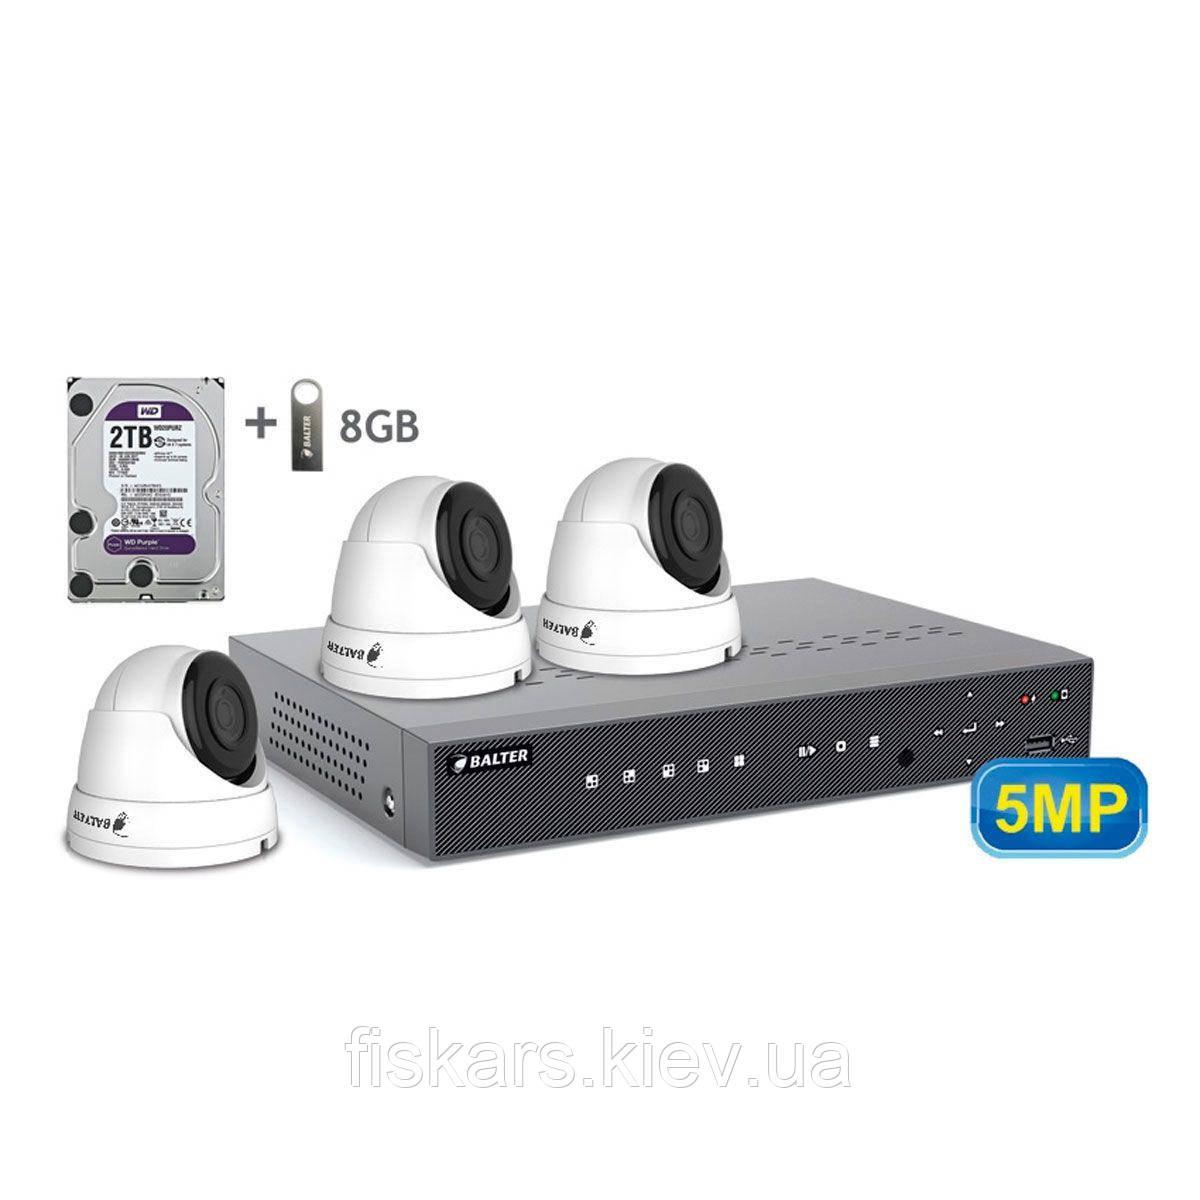 Комплект видеонаблюдения BALTER KIT 5MP 3Dome